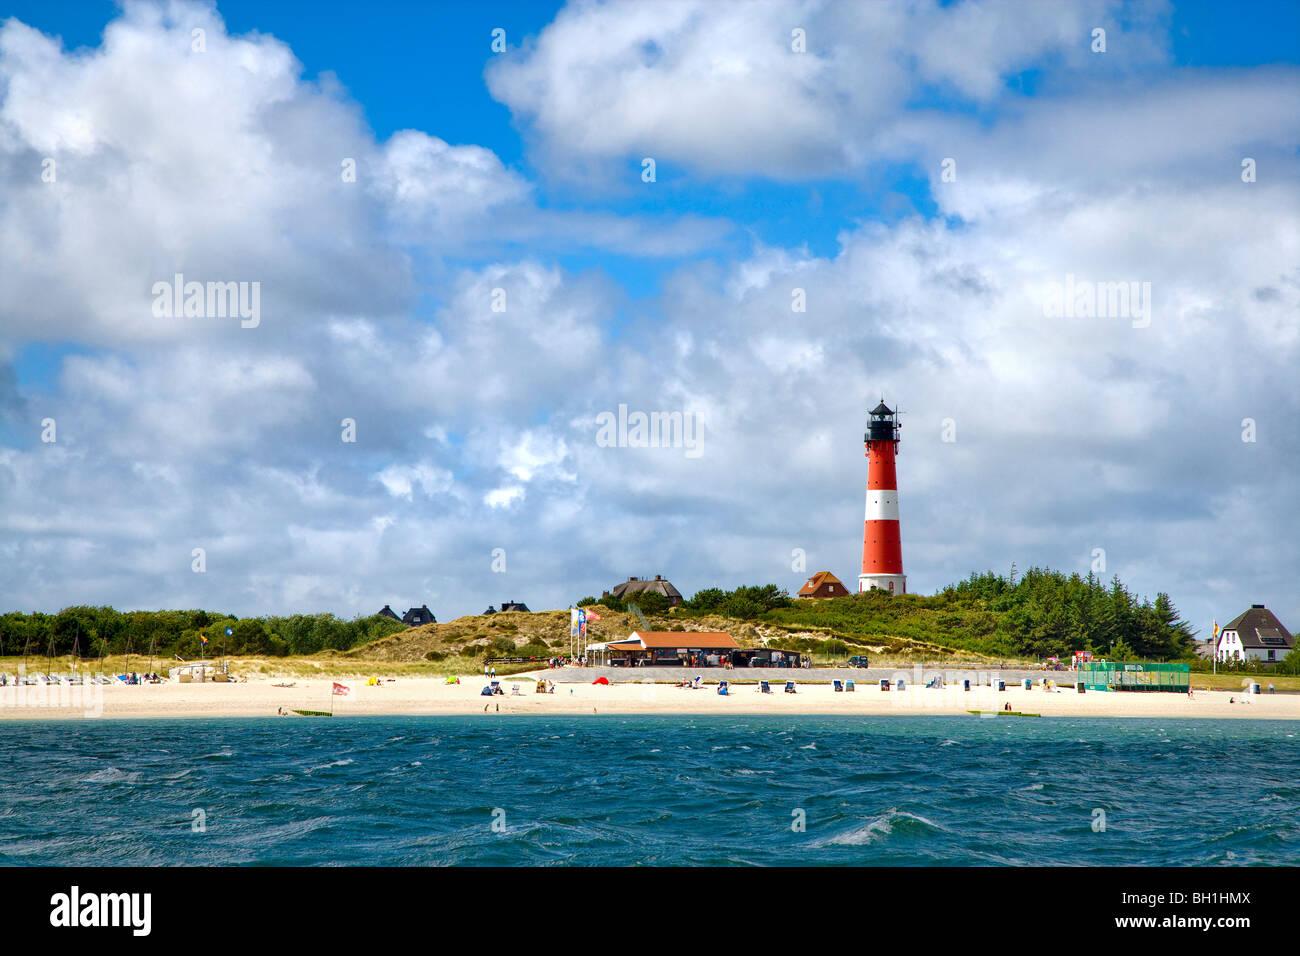 Lighthouse, Hoernum, Sylt Island, Schleswig-Holstein, Germany - Stock Image